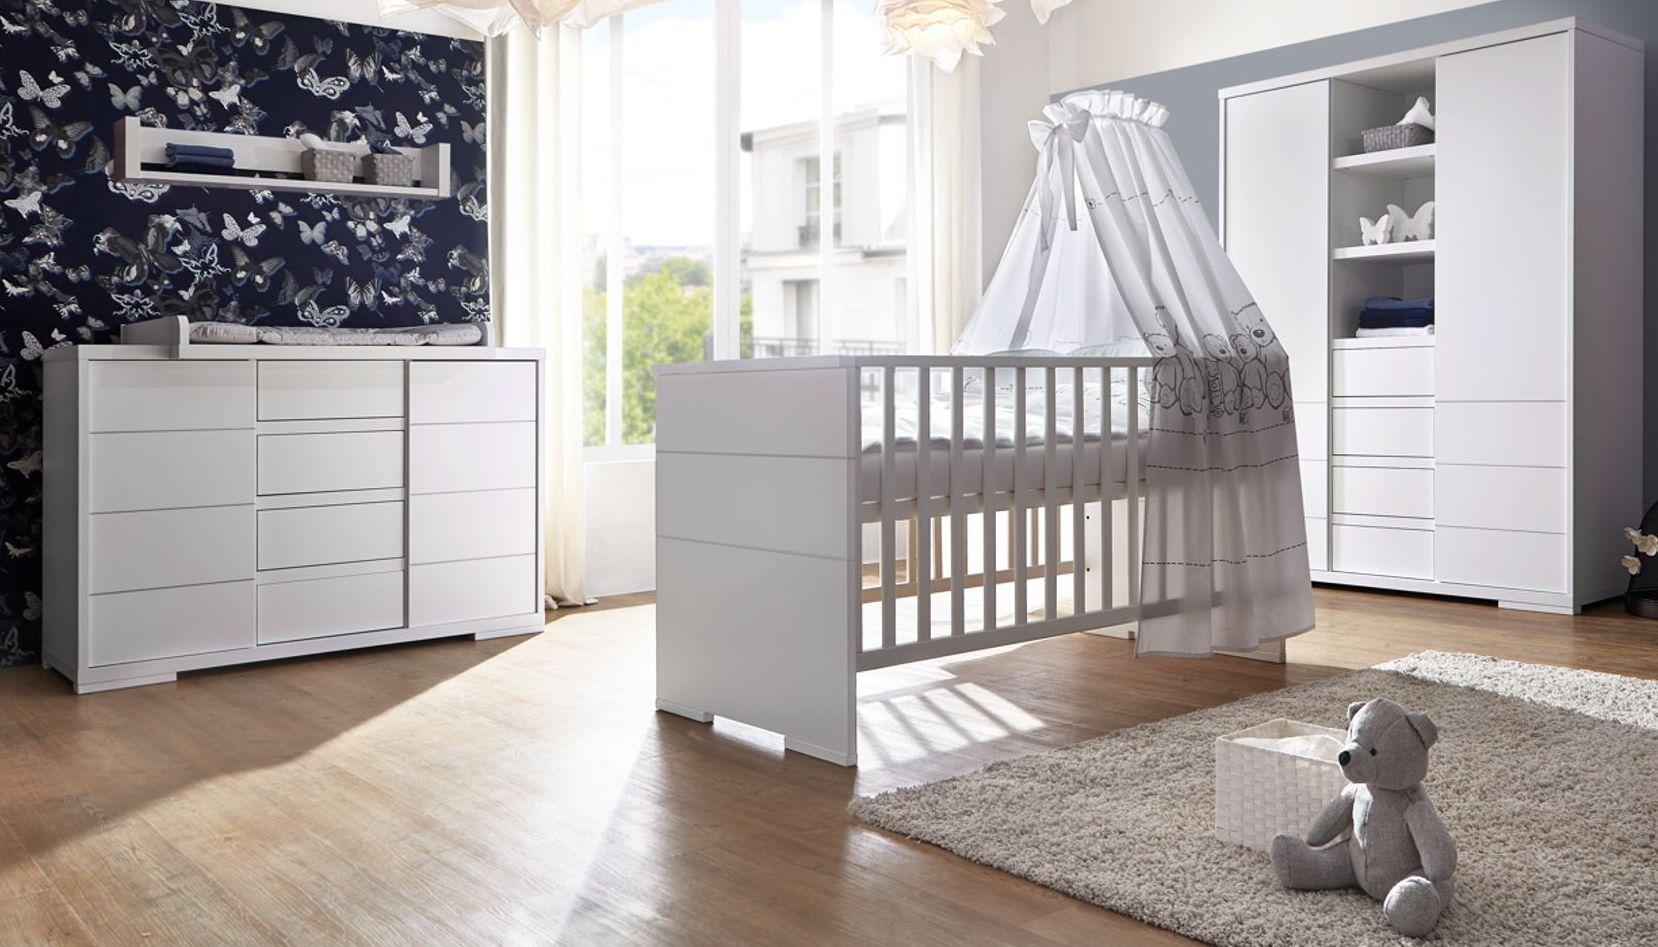 d tsk a studentsk pokoje d tsk pokoj schardt maxx white kvalitn d tsk a studentsk. Black Bedroom Furniture Sets. Home Design Ideas